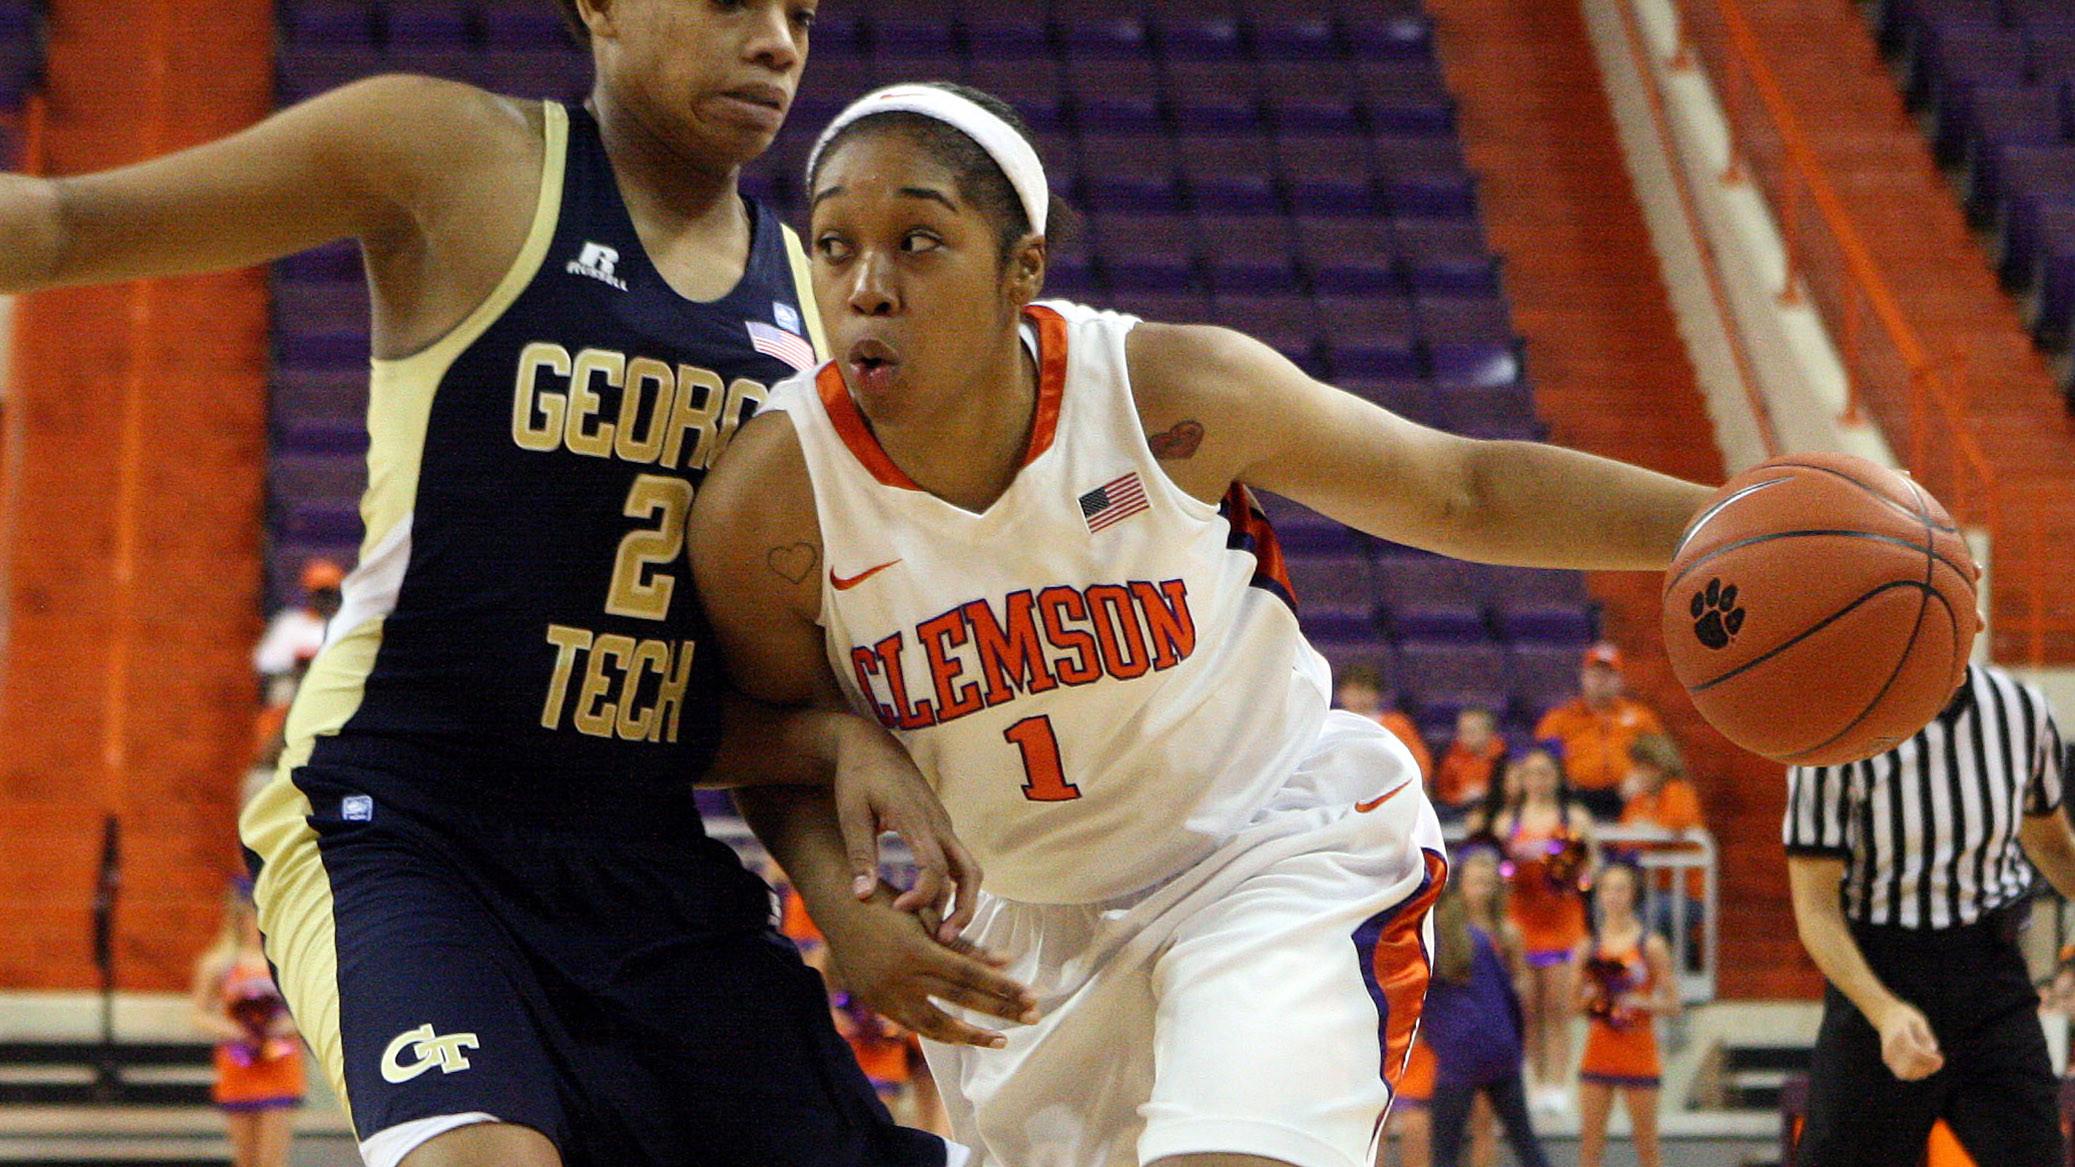 Lady Tigers to Play at No. 4 Duke Thursday